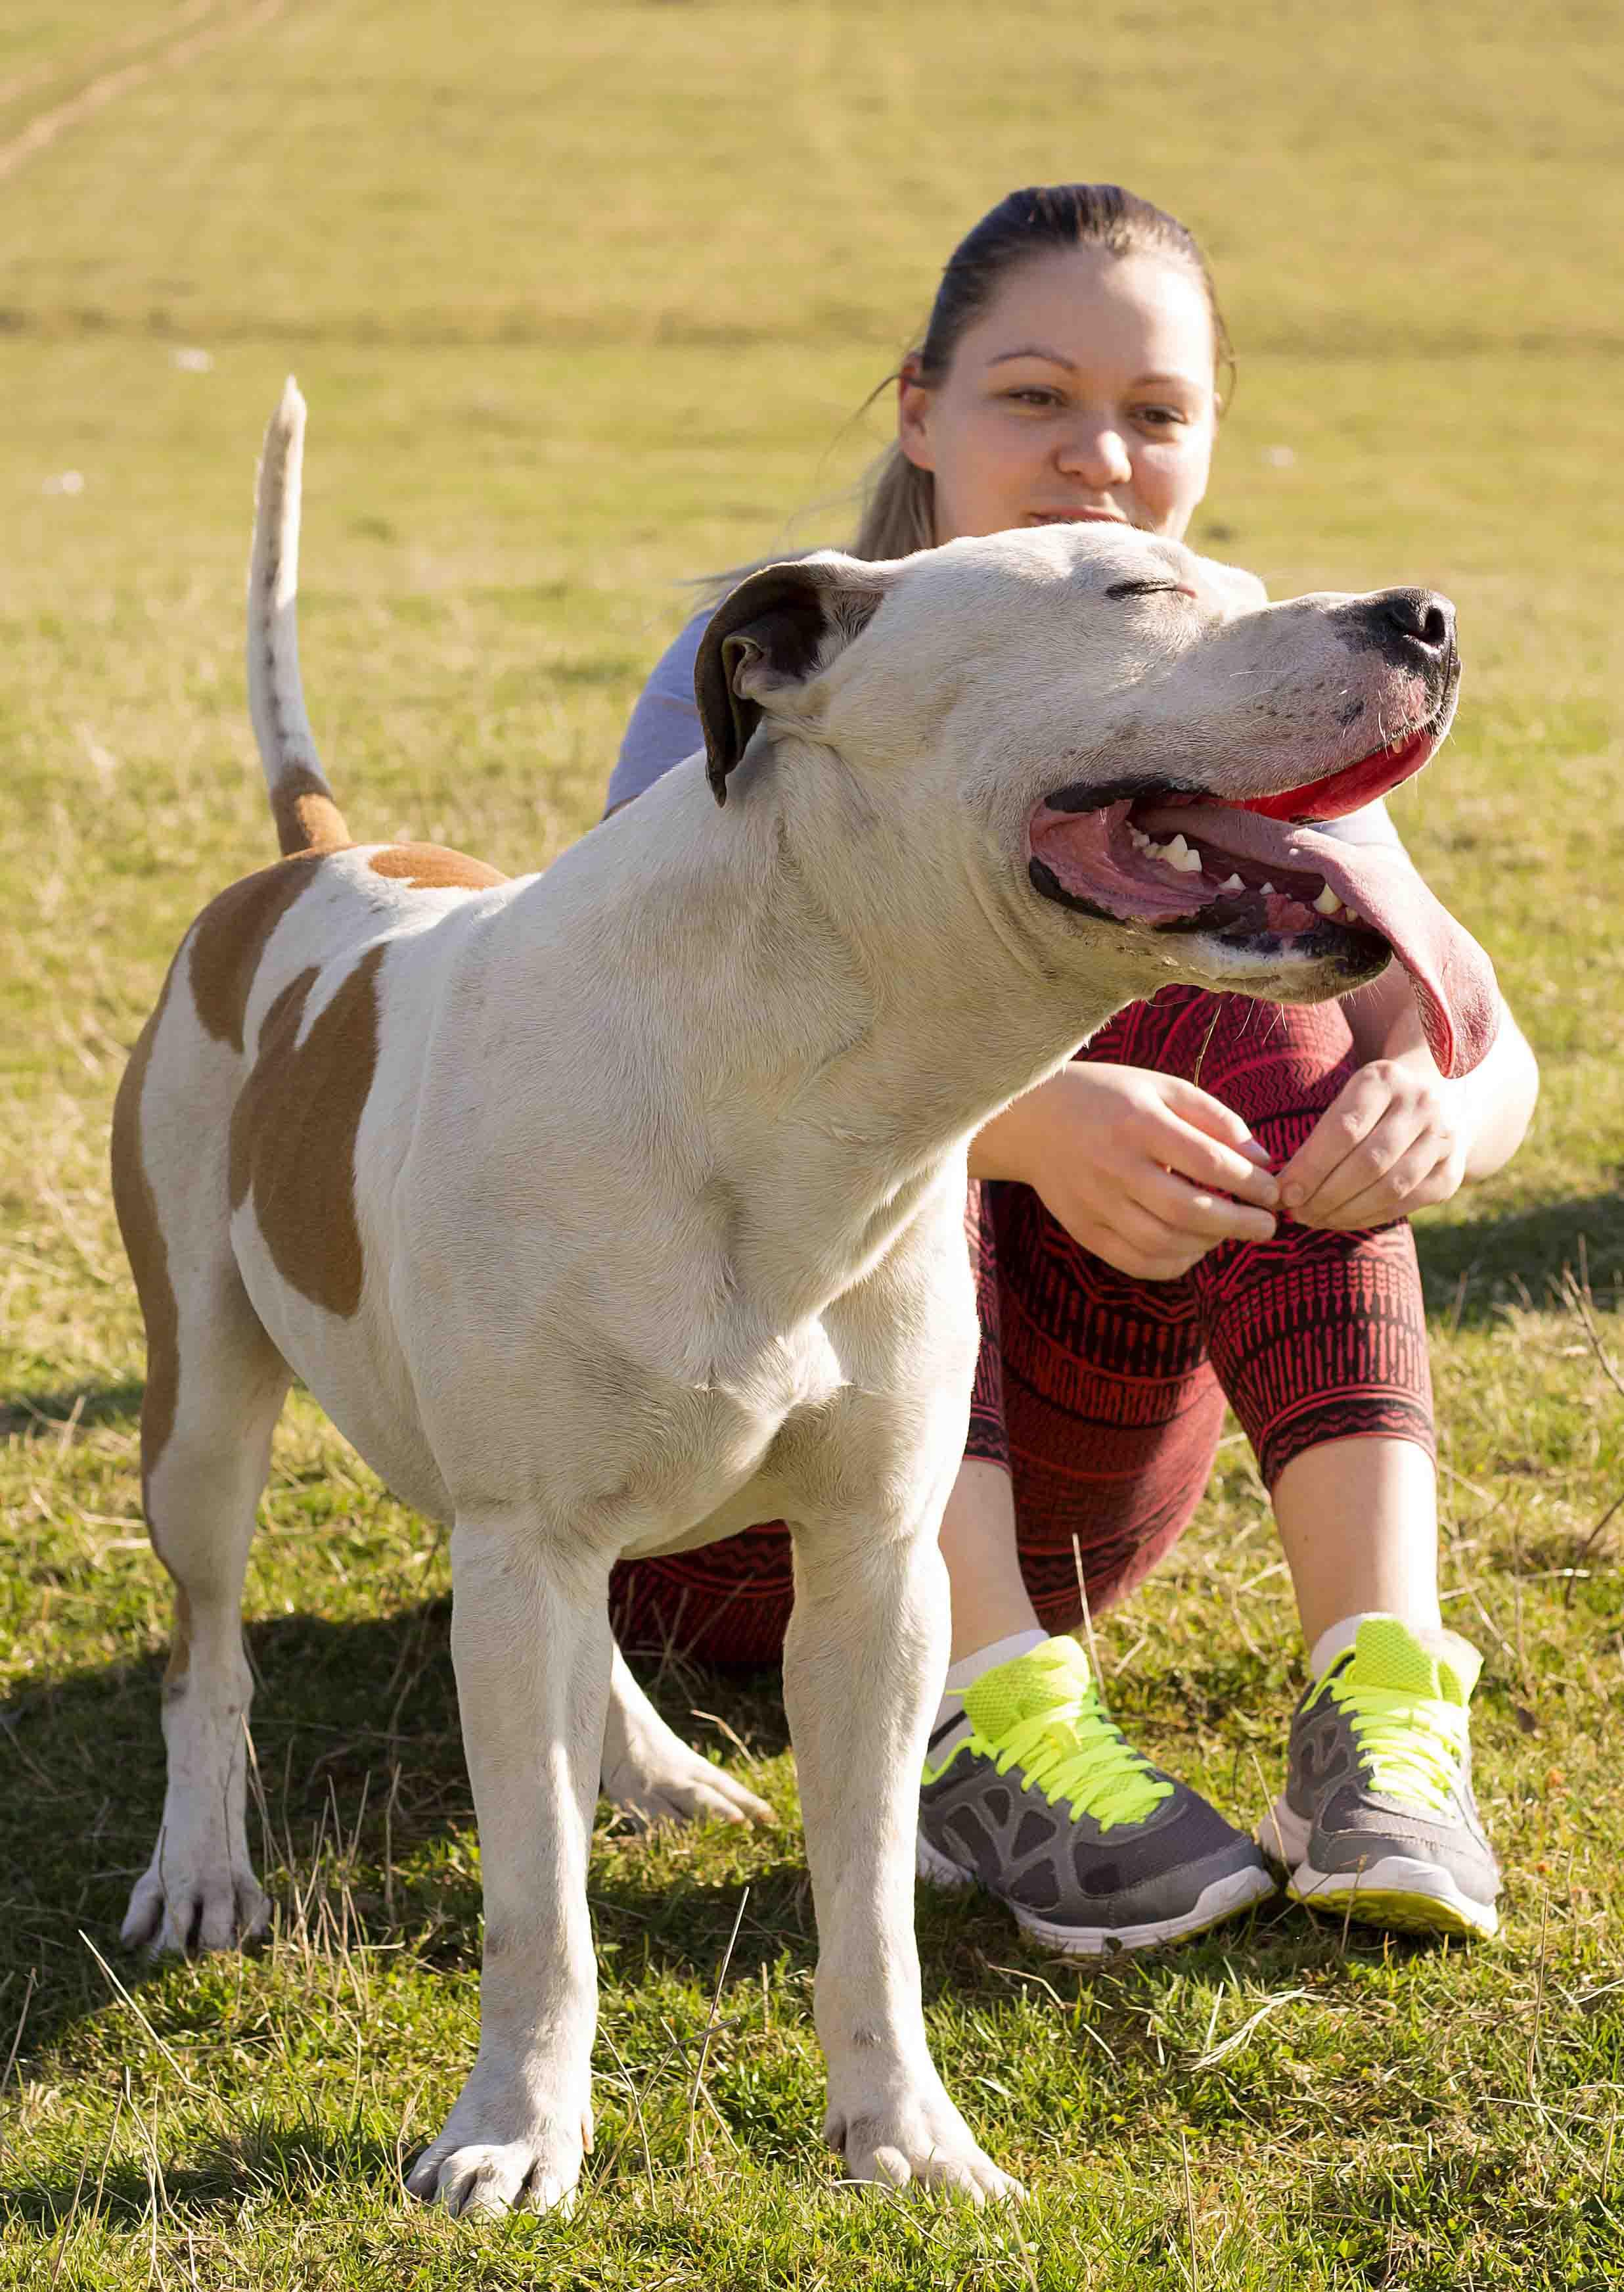 Pitbull perros niñera muy familiar y amigable